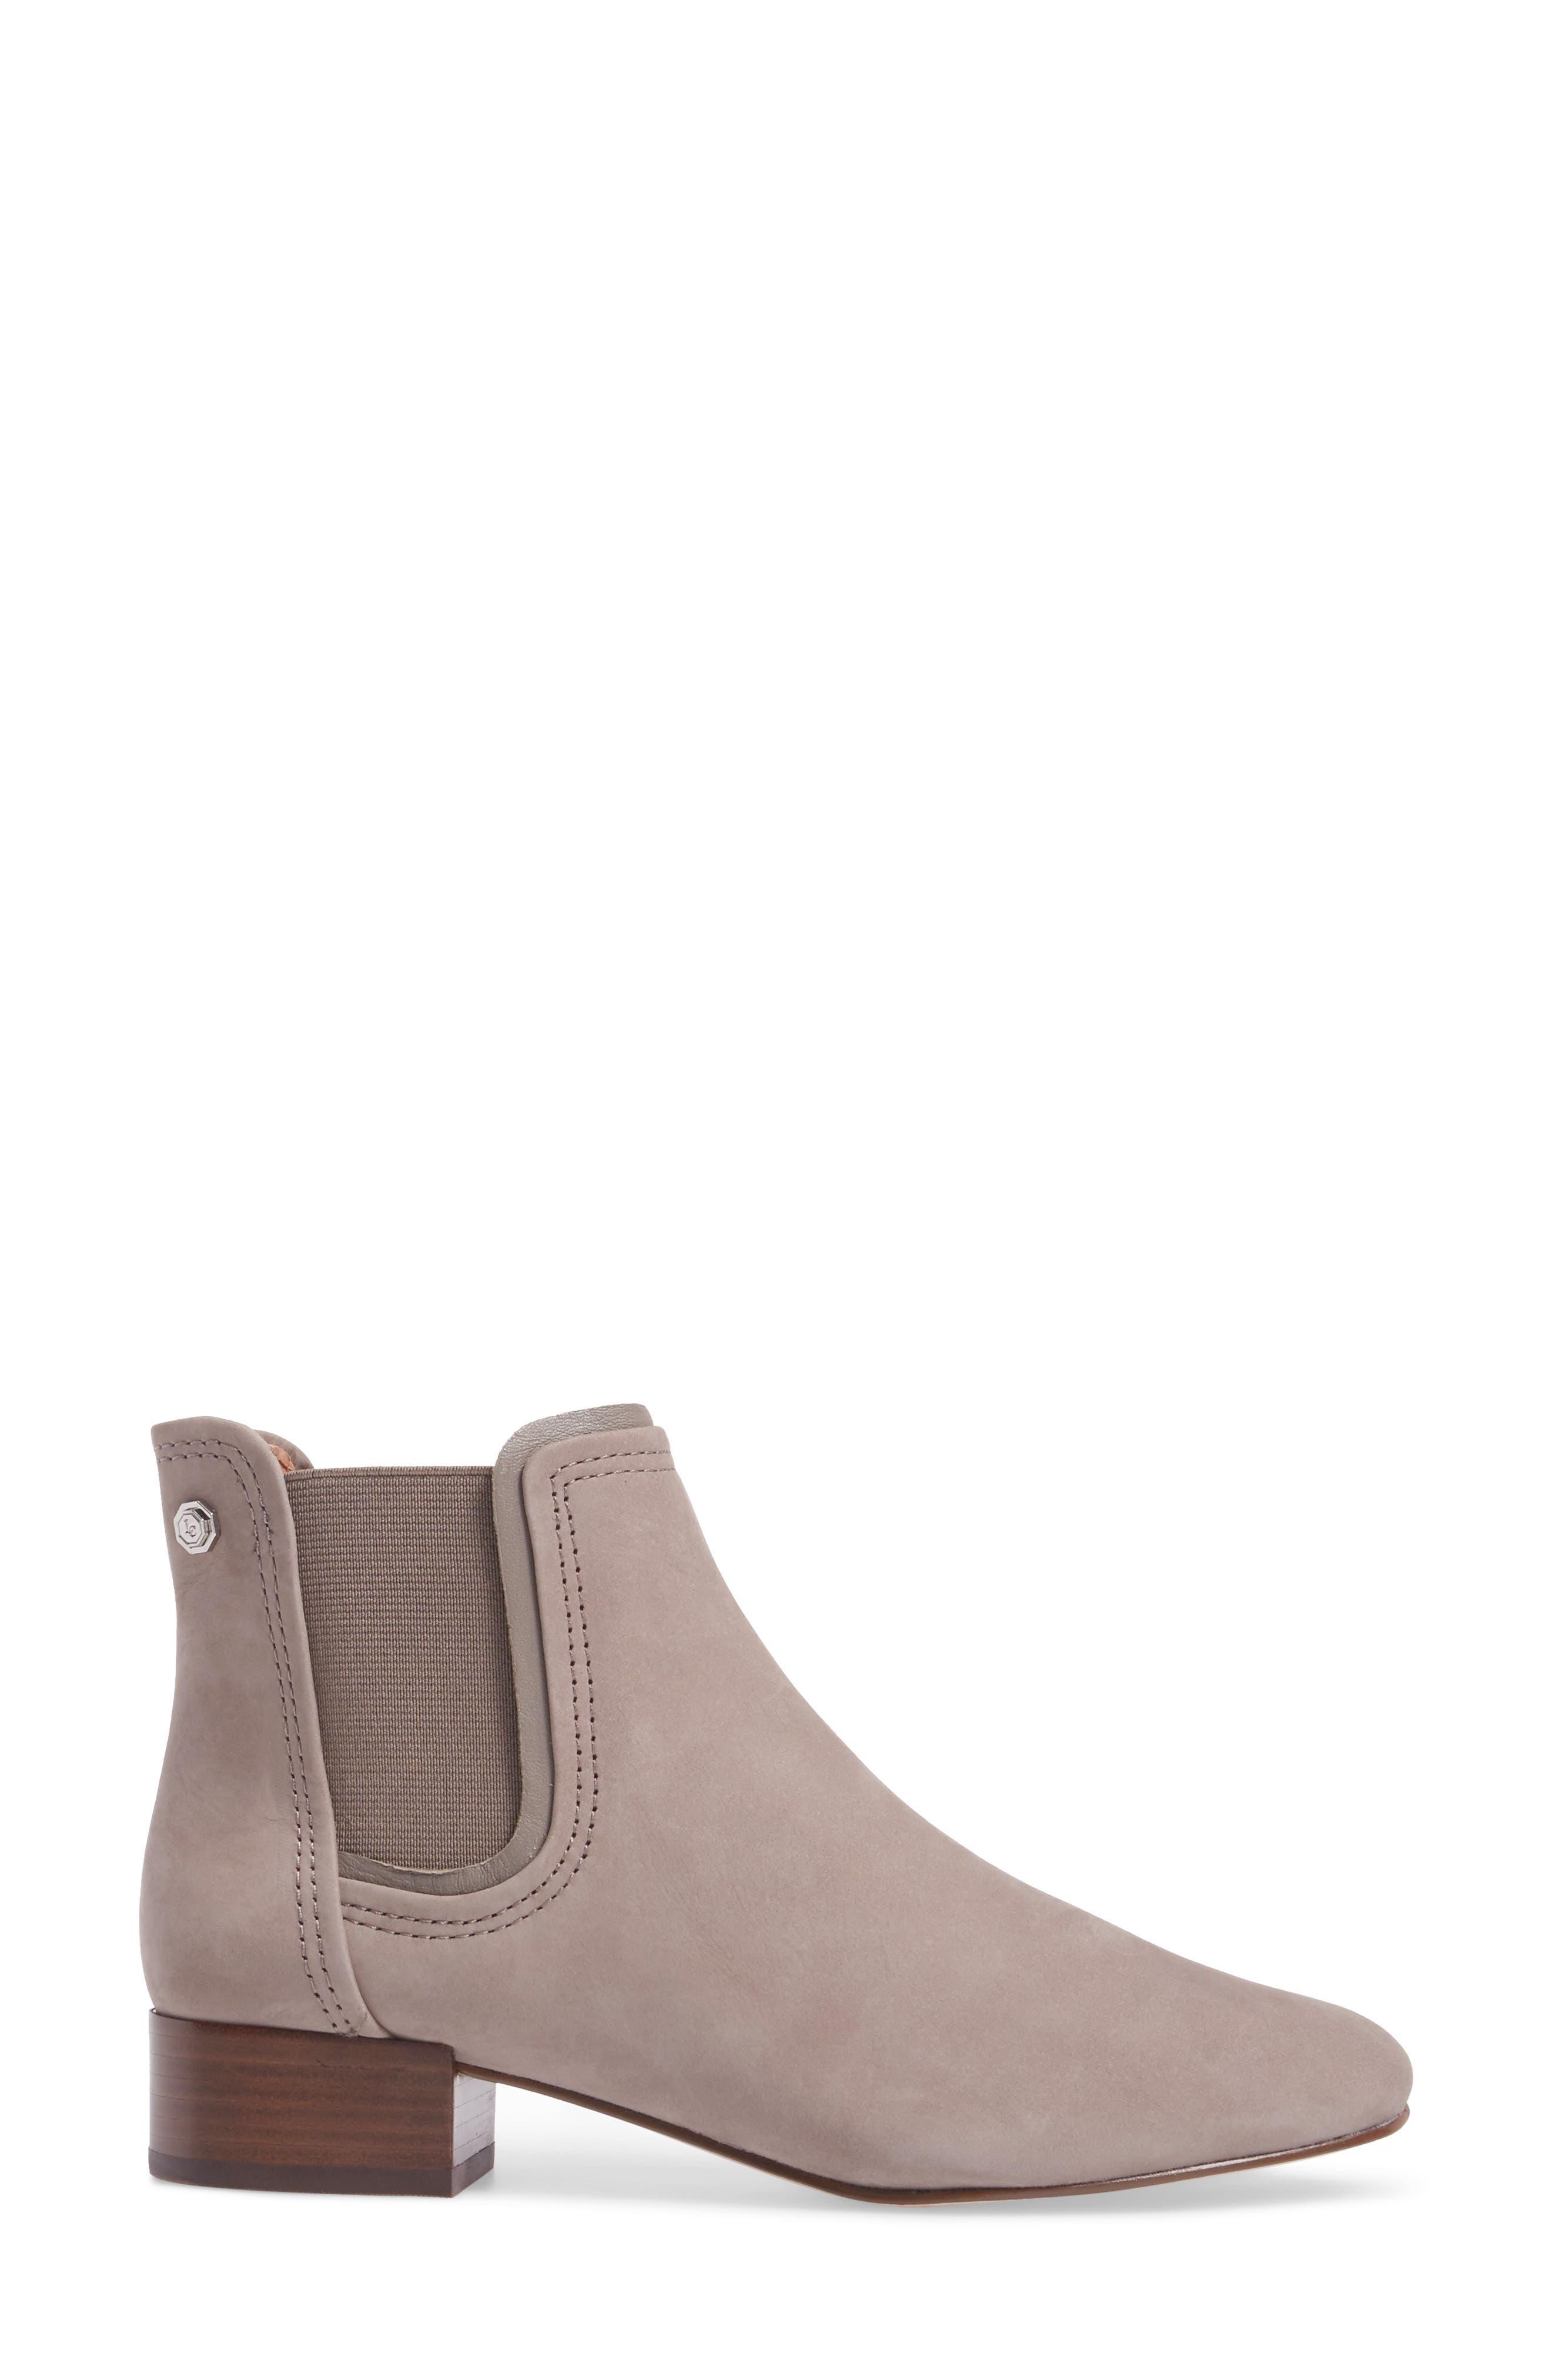 Waldon Chelsea Boot,                             Alternate thumbnail 3, color,                             Gravel Leather